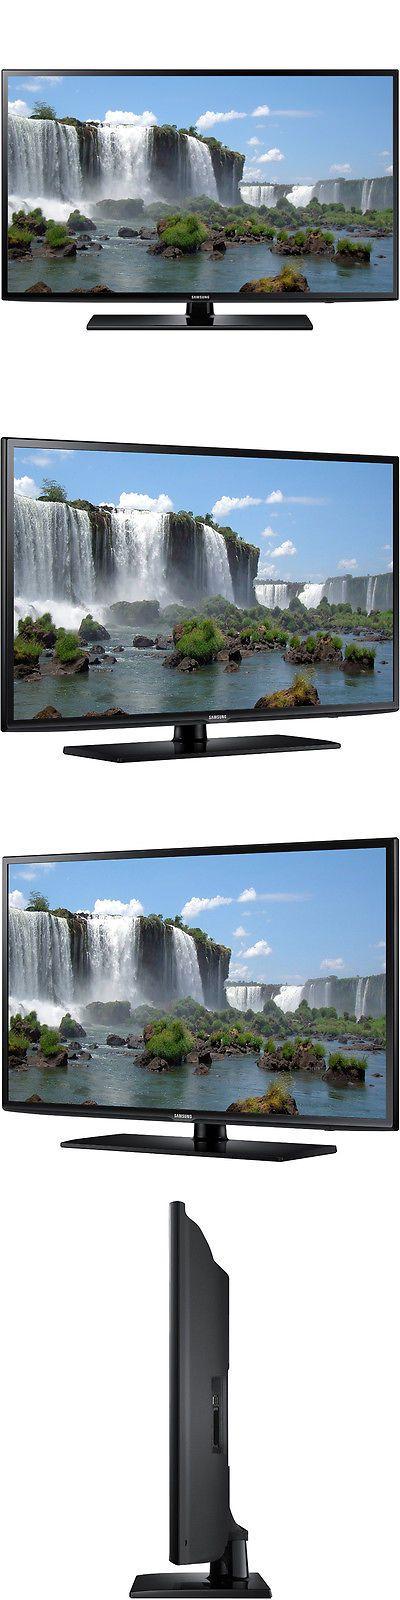 Smart TV: Samsung Un65j6200 - 65 Inch Full Hd 1080P 120Hz Smart Led Hdtv -> BUY IT NOW ONLY: $999 on eBay!